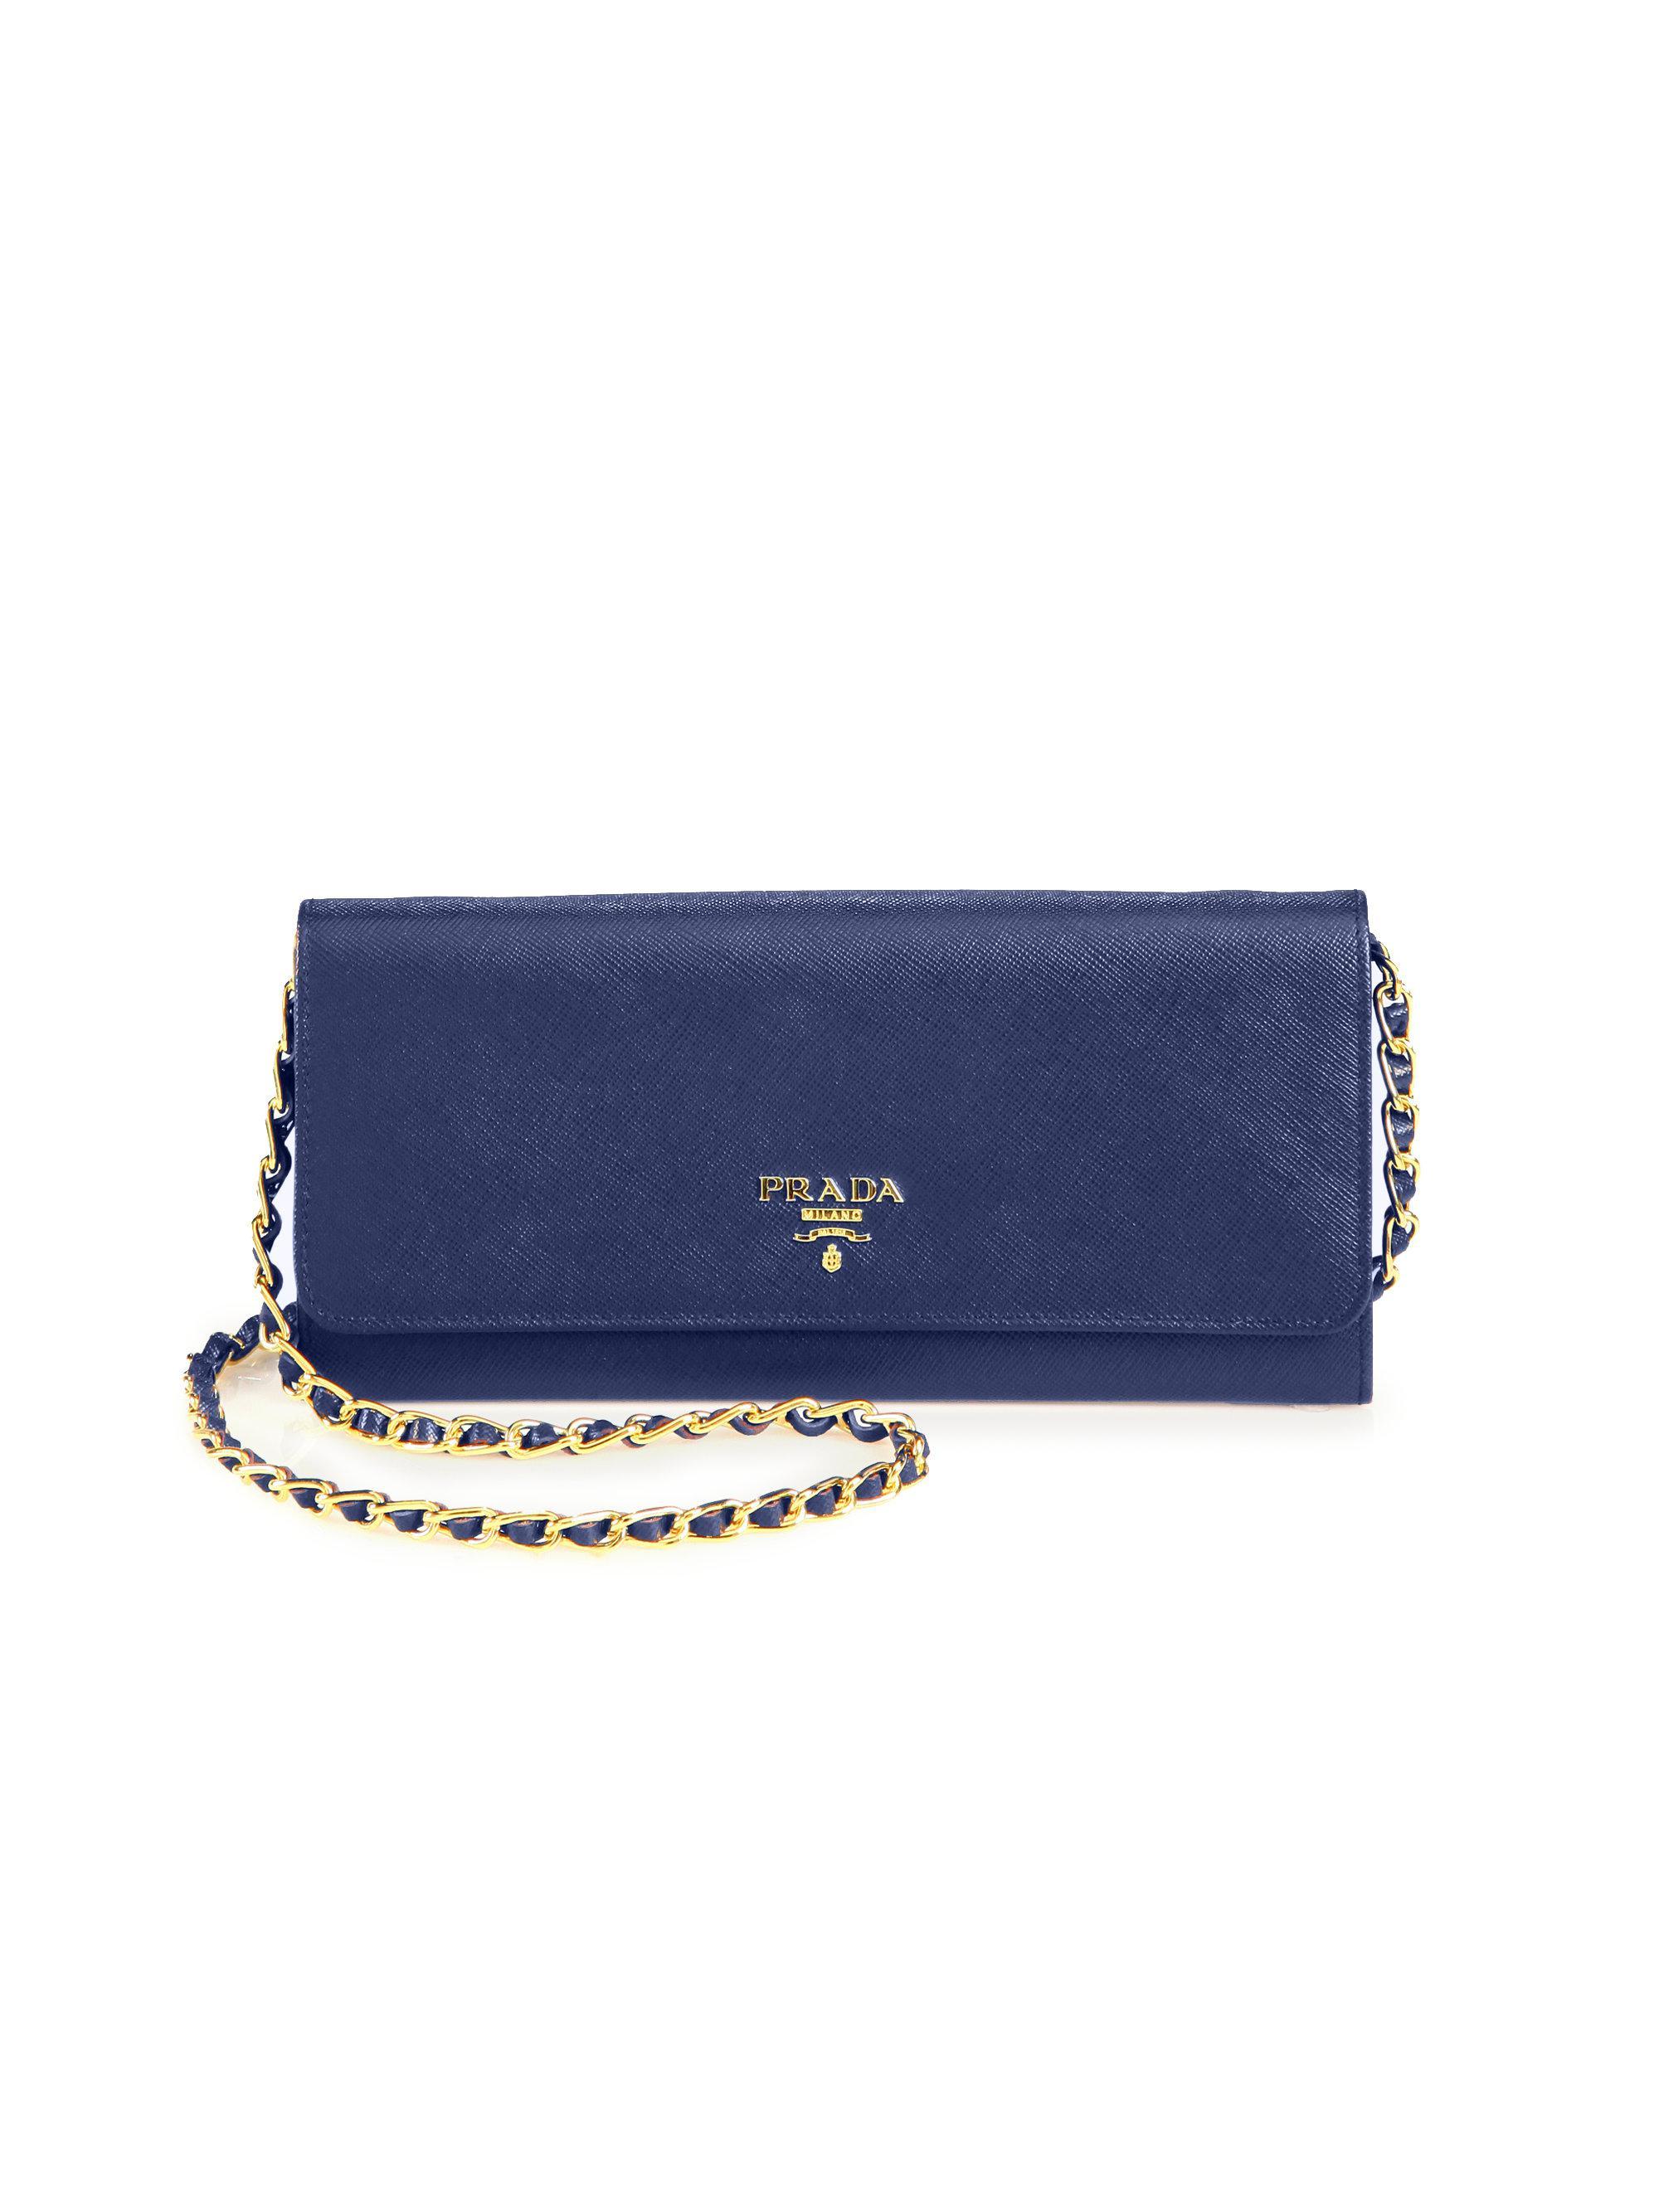 00af06853e62 ... usa lyst prada saffiano metal oro chain wallet in blue beaec 973c4